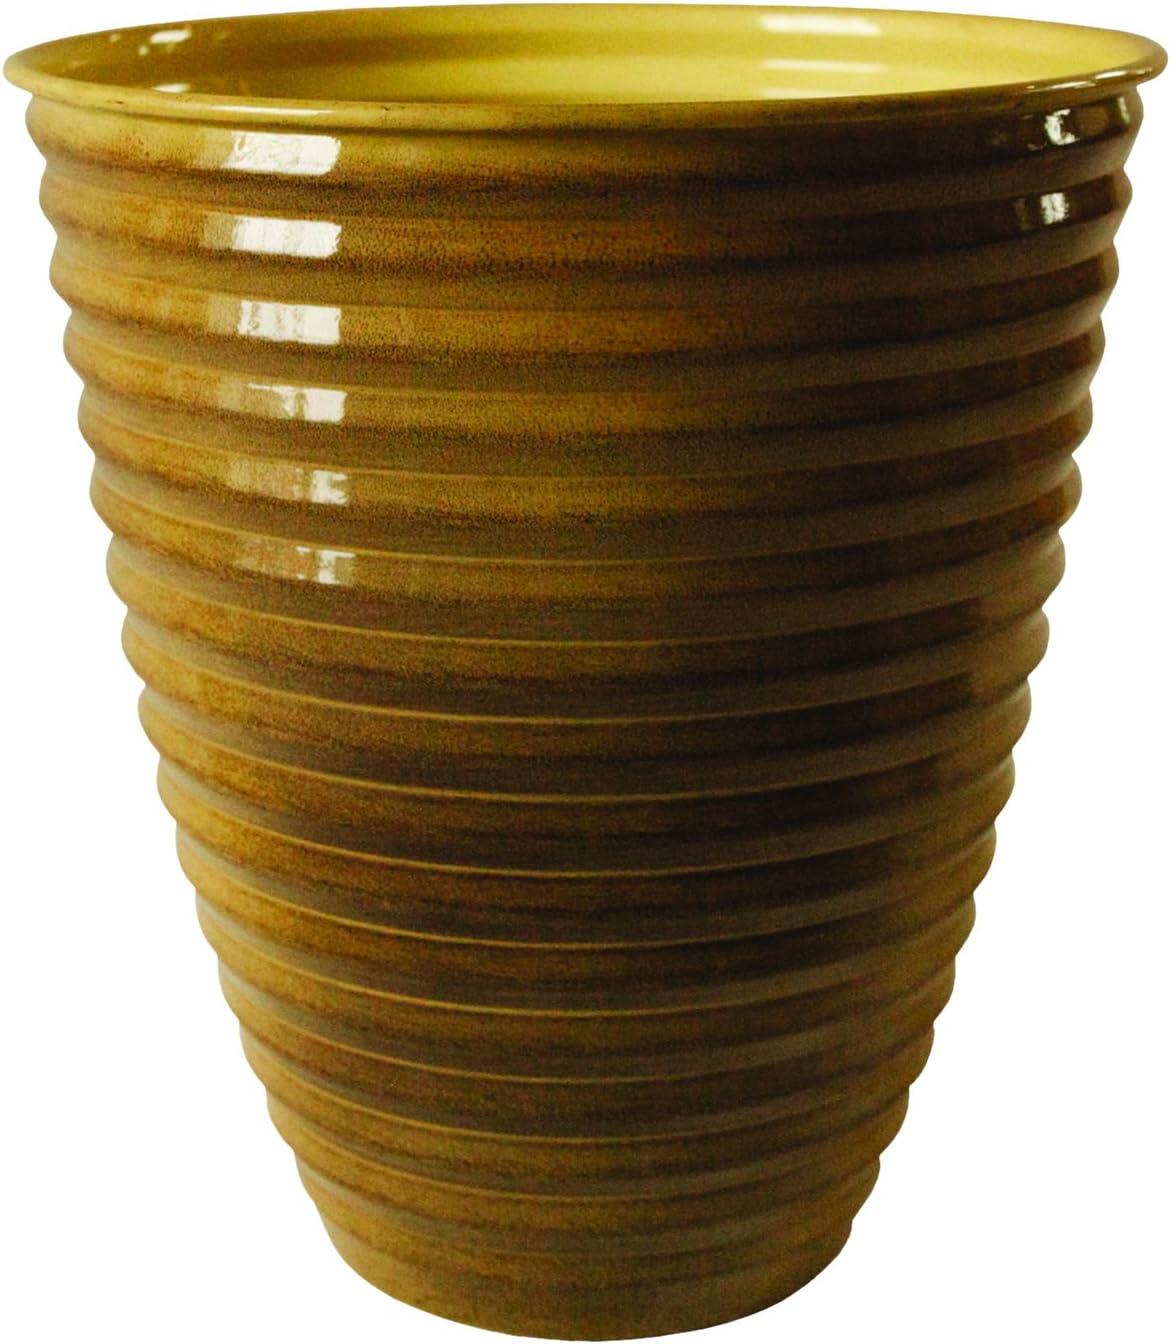 "Robert Allen MPT01973 Avondale Classic Flower Pot, 17"", Chamomile"